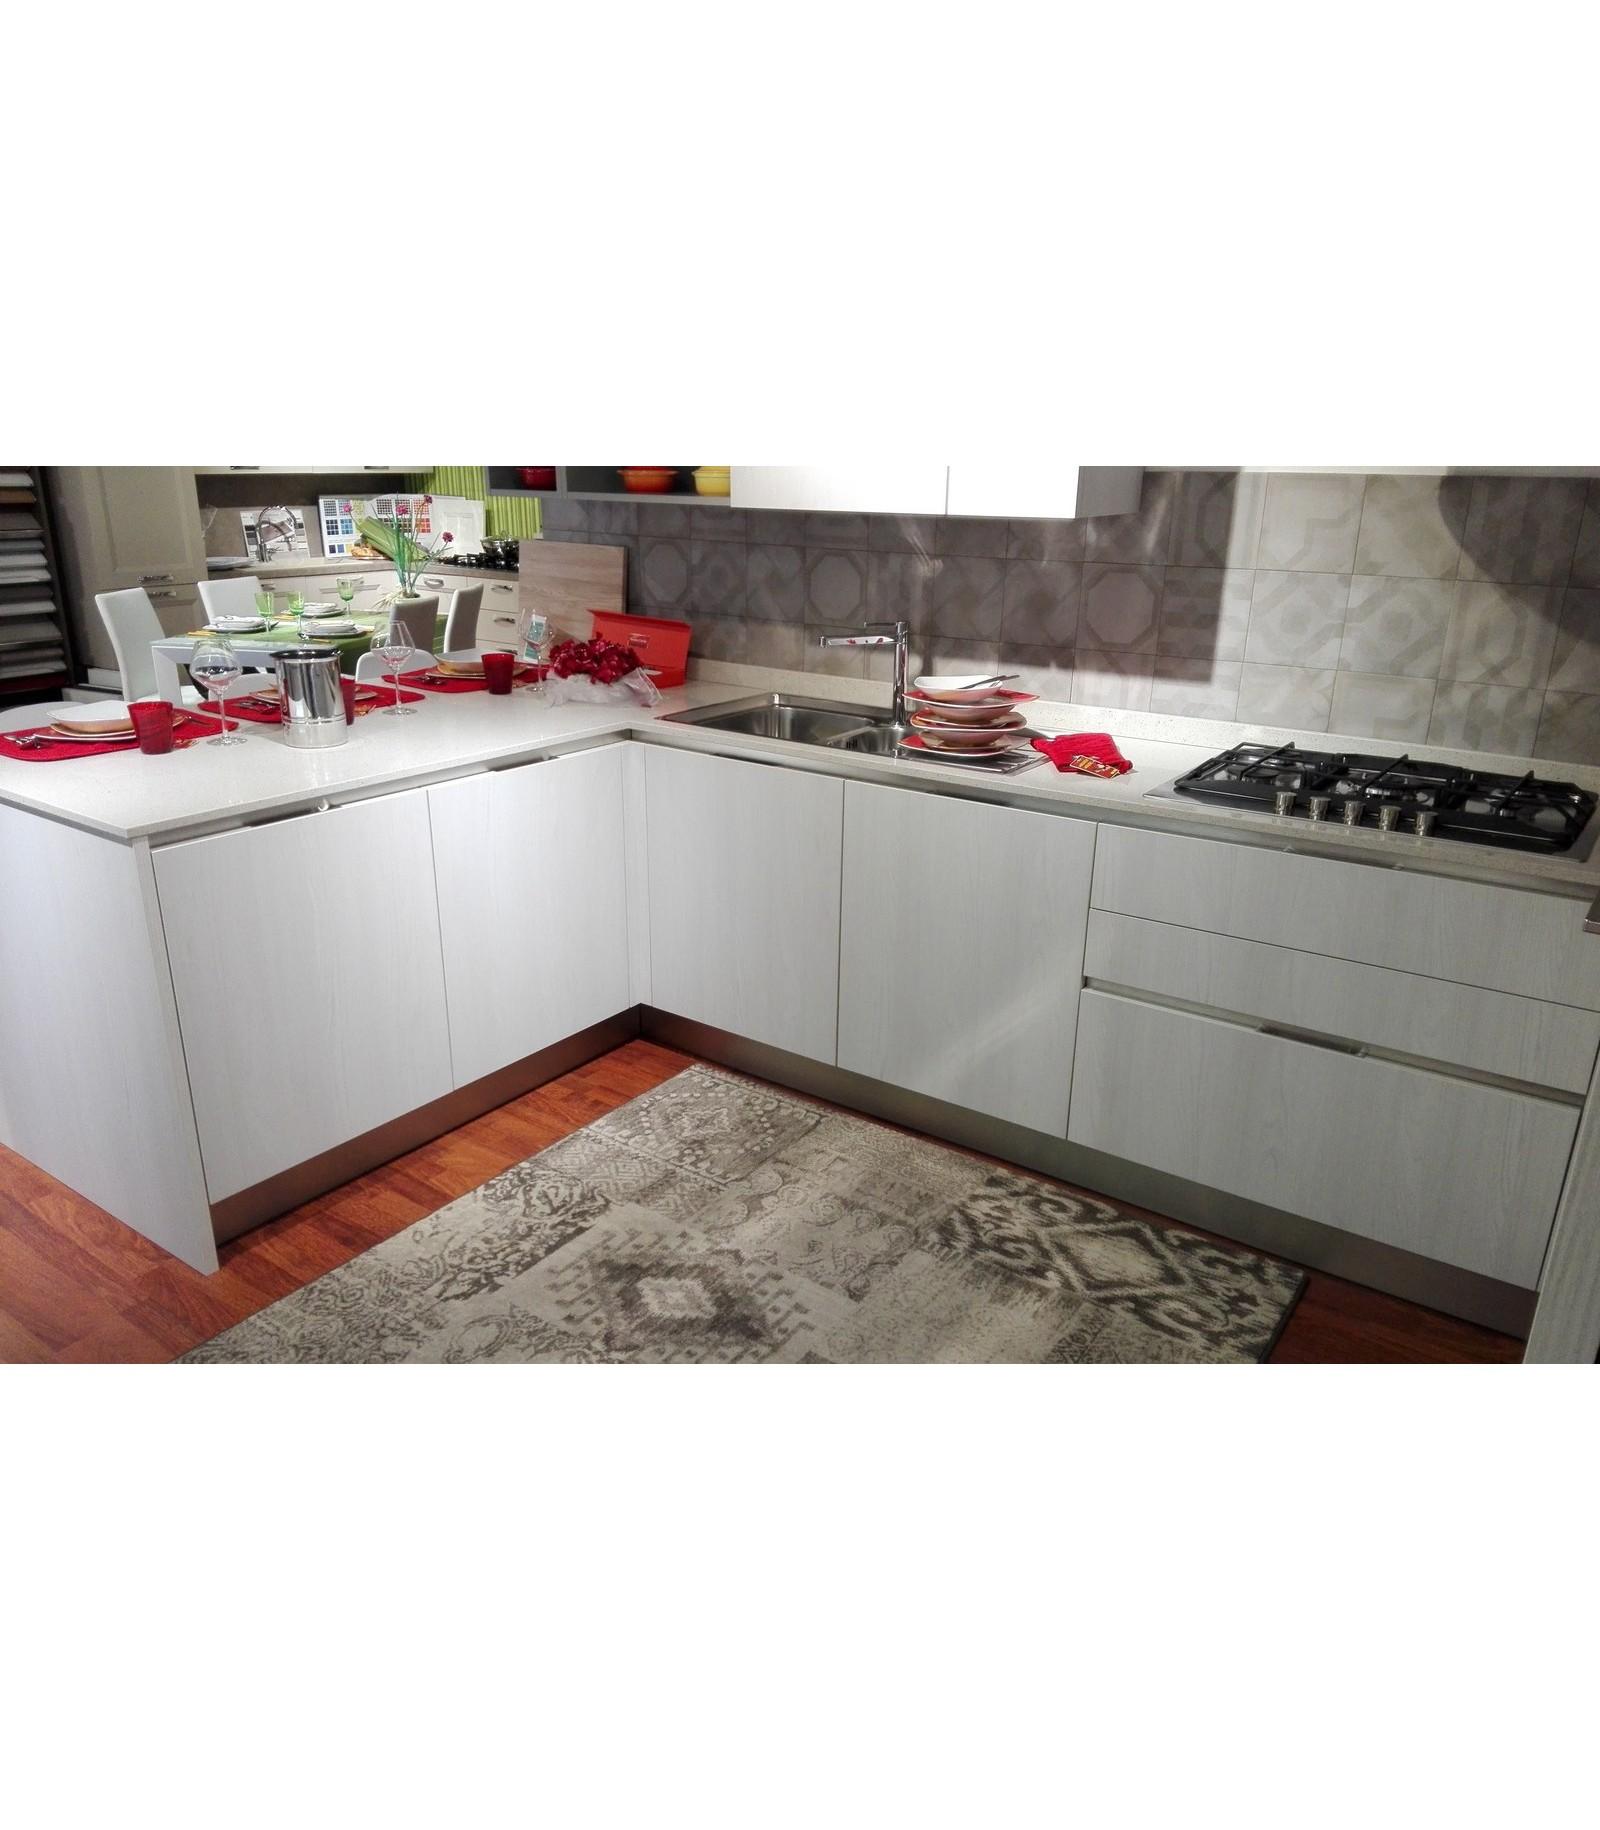 Outlet Cucine Veneta Cucine.Cucina Sistematica Olmo By Veneta Cucine Outlet Mariotti Casa